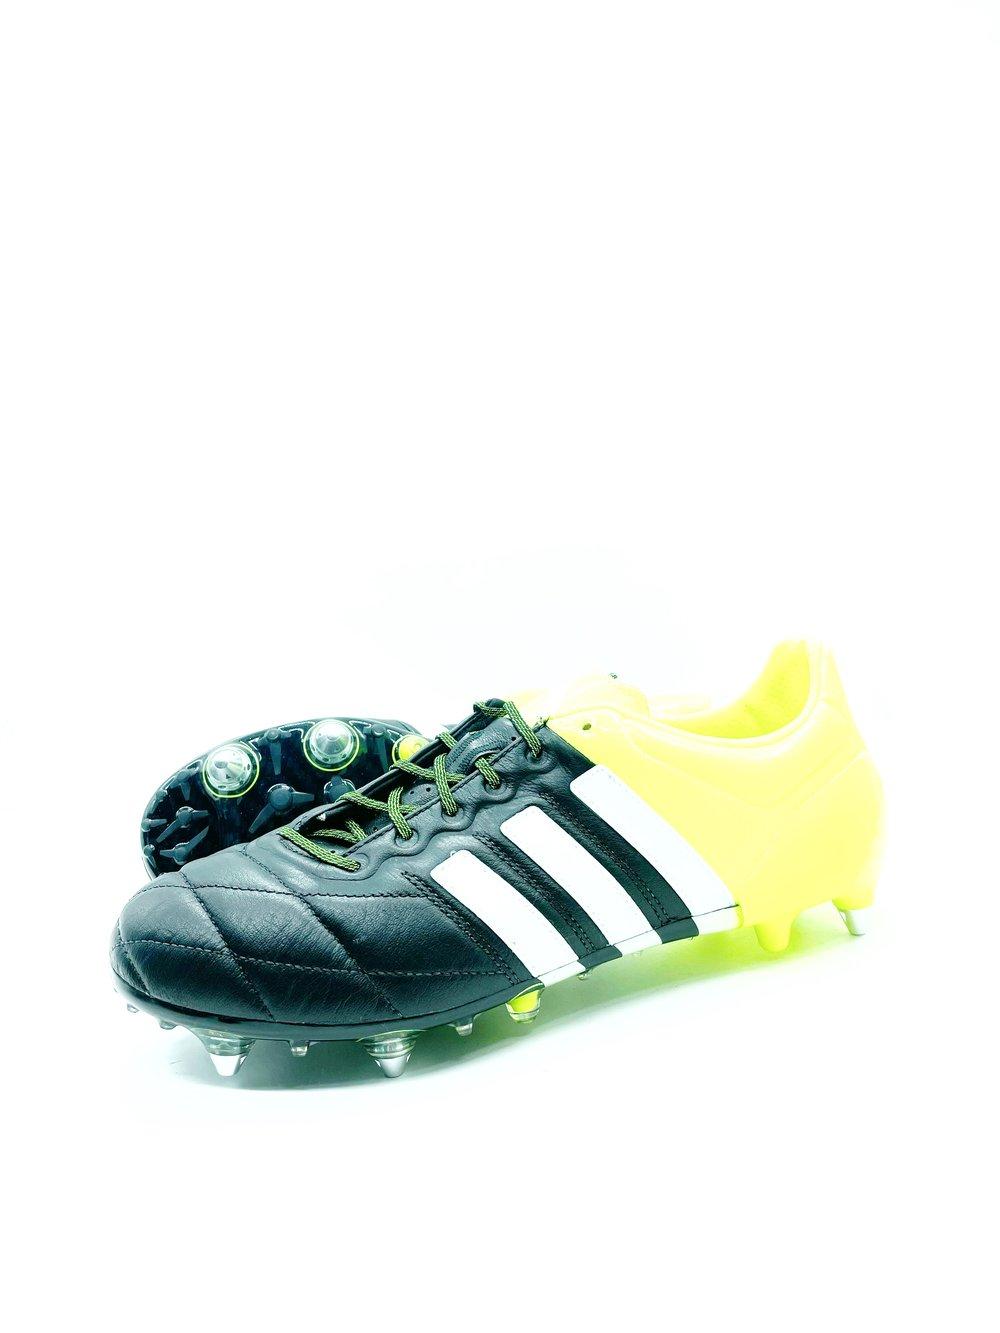 Image of Adidas ACE 15.1 SG